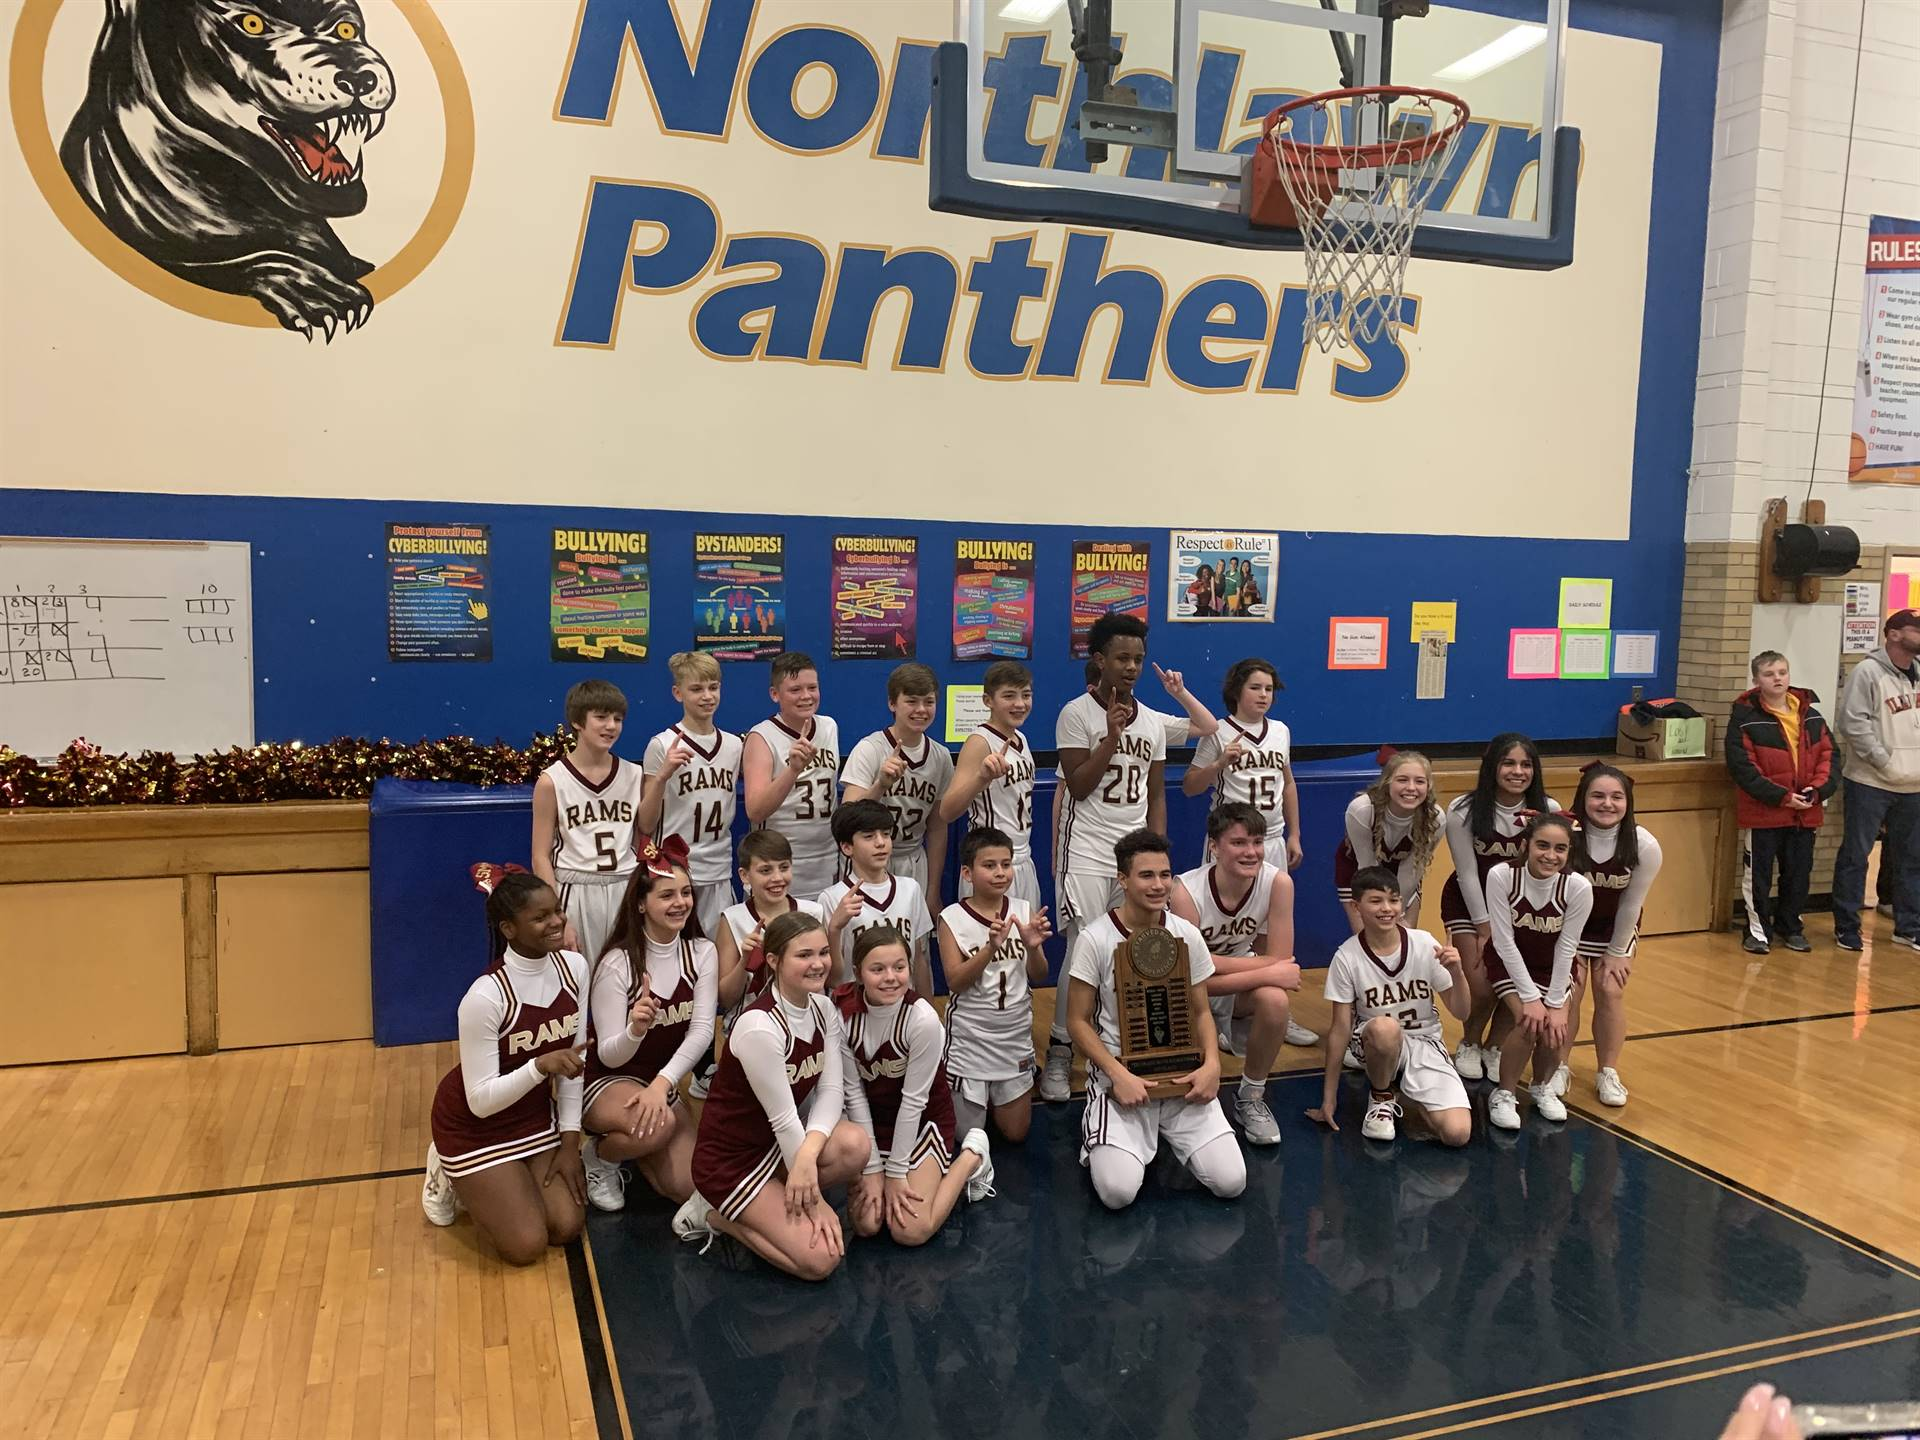 Shepherd Boys Basketball - 1st Place